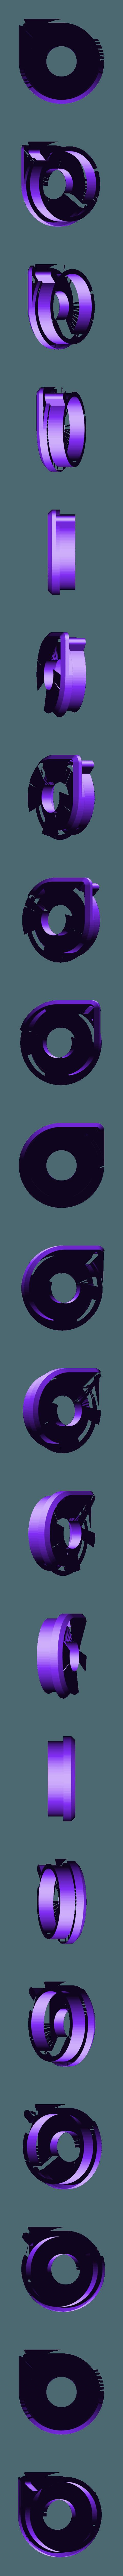 Nickel Roll Lid.stl Download free STL file Coin Rolls • Design to 3D print, Hom3d